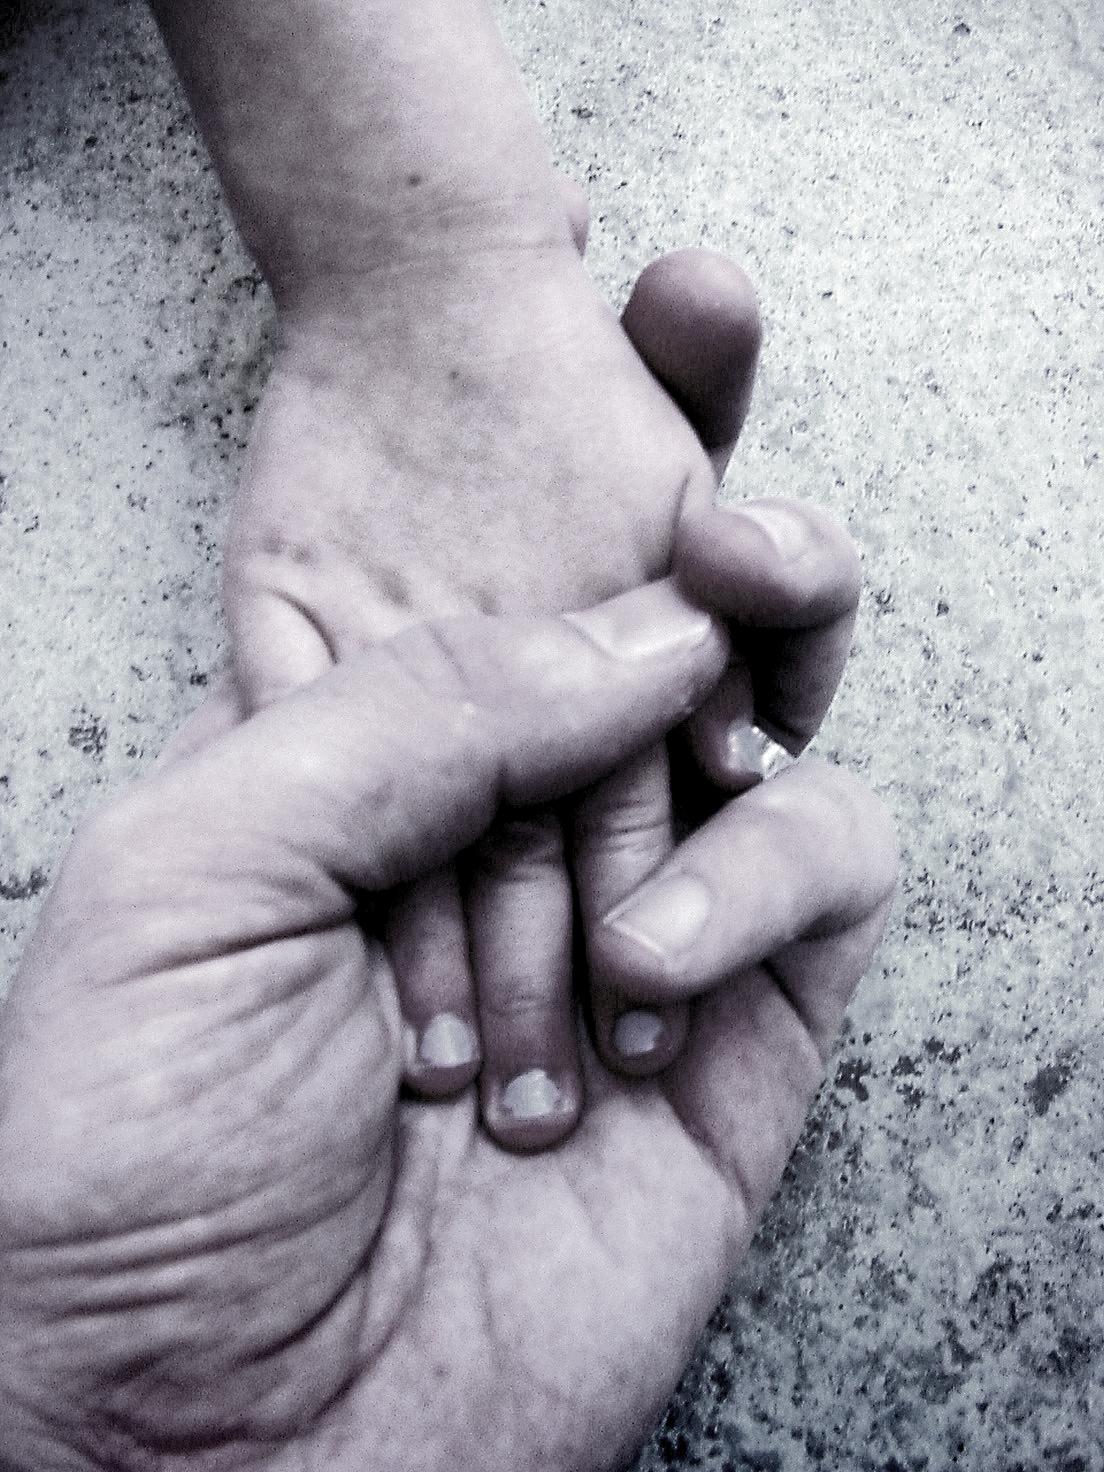 man-holding-childs-hand.jpg